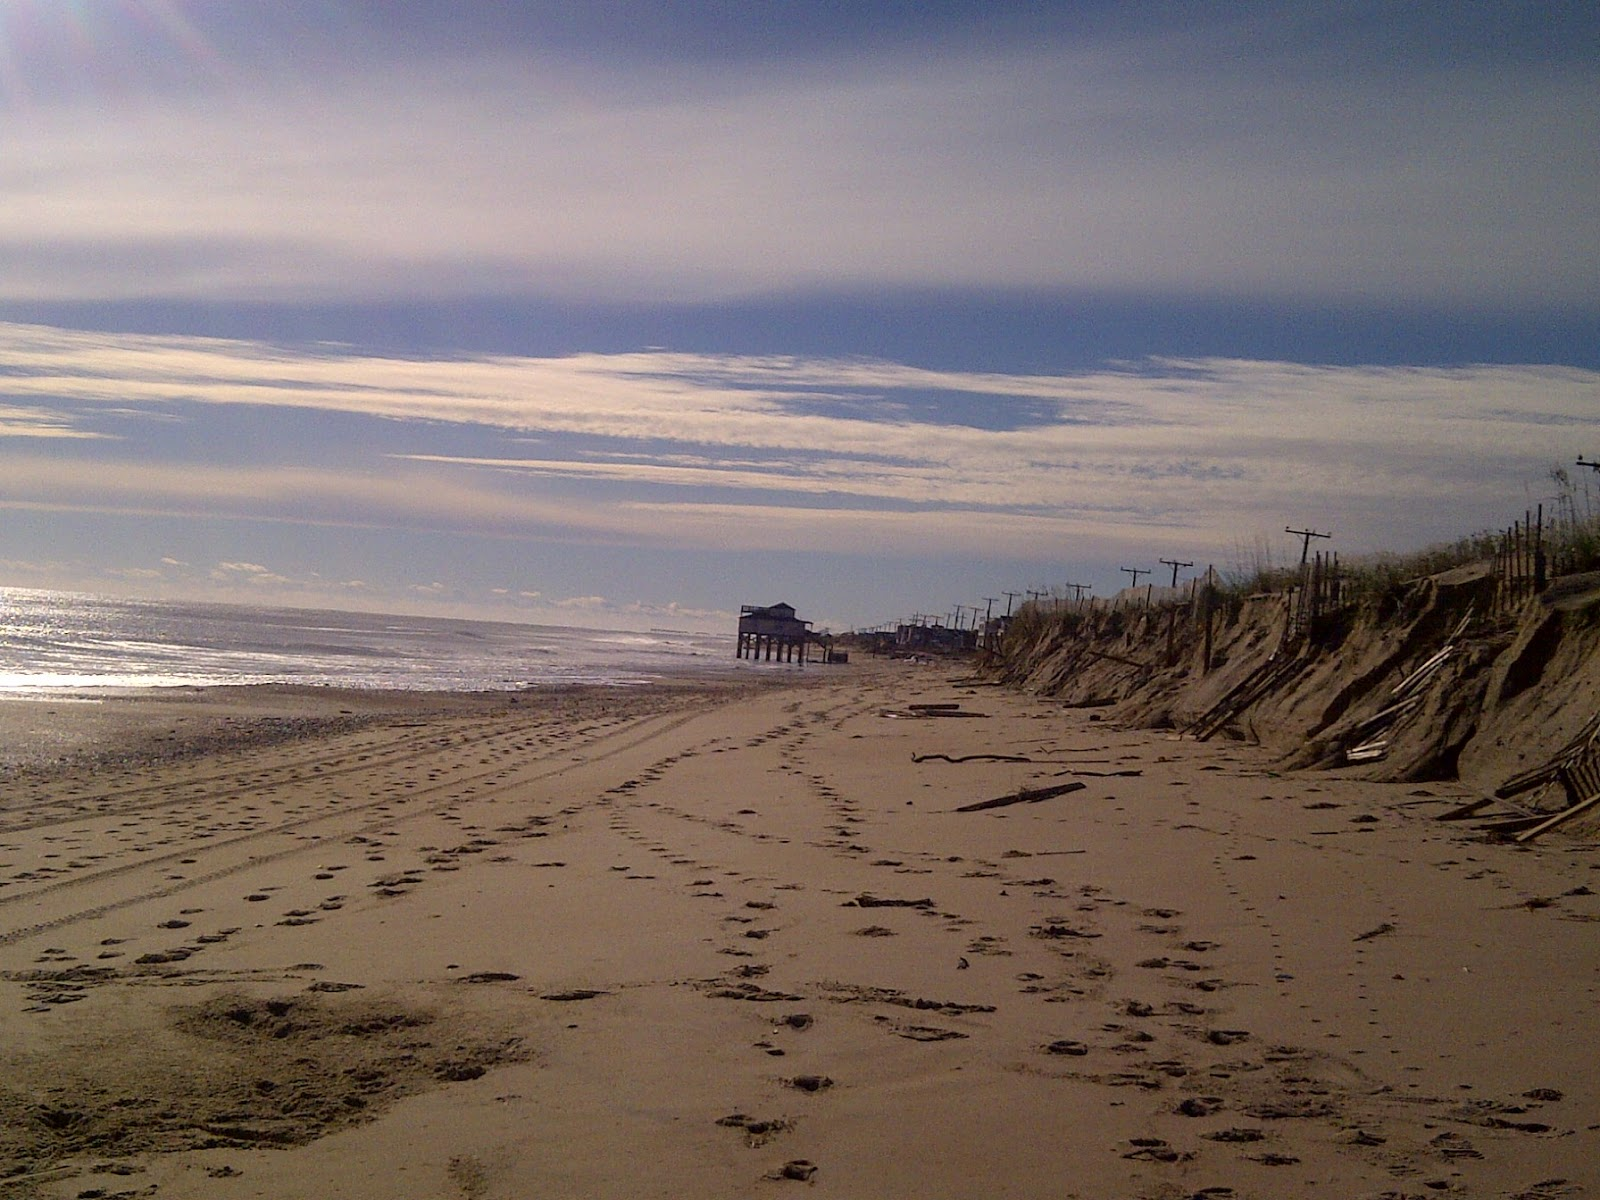 Kitty Hawk Beach Looking South